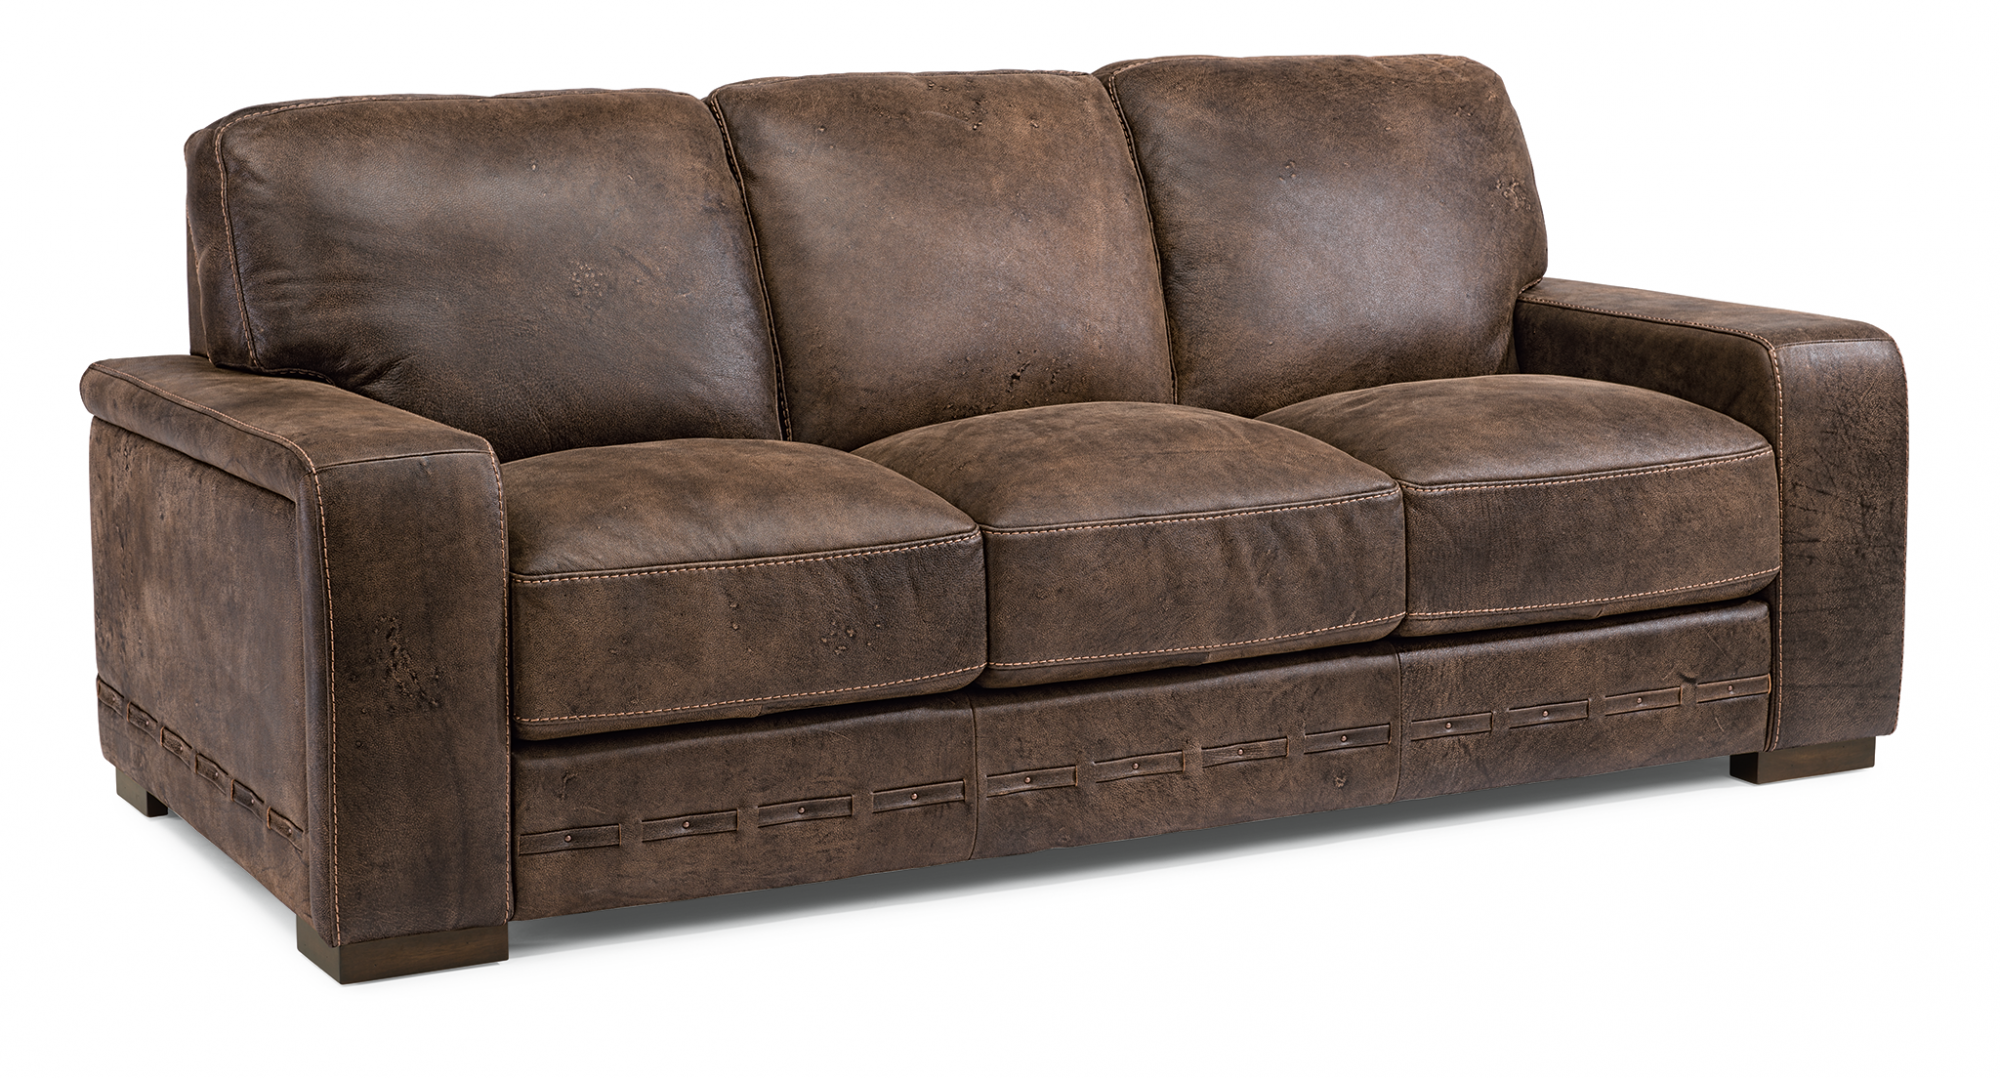 Front Elevation Of Sofa : Buxton flexsteel